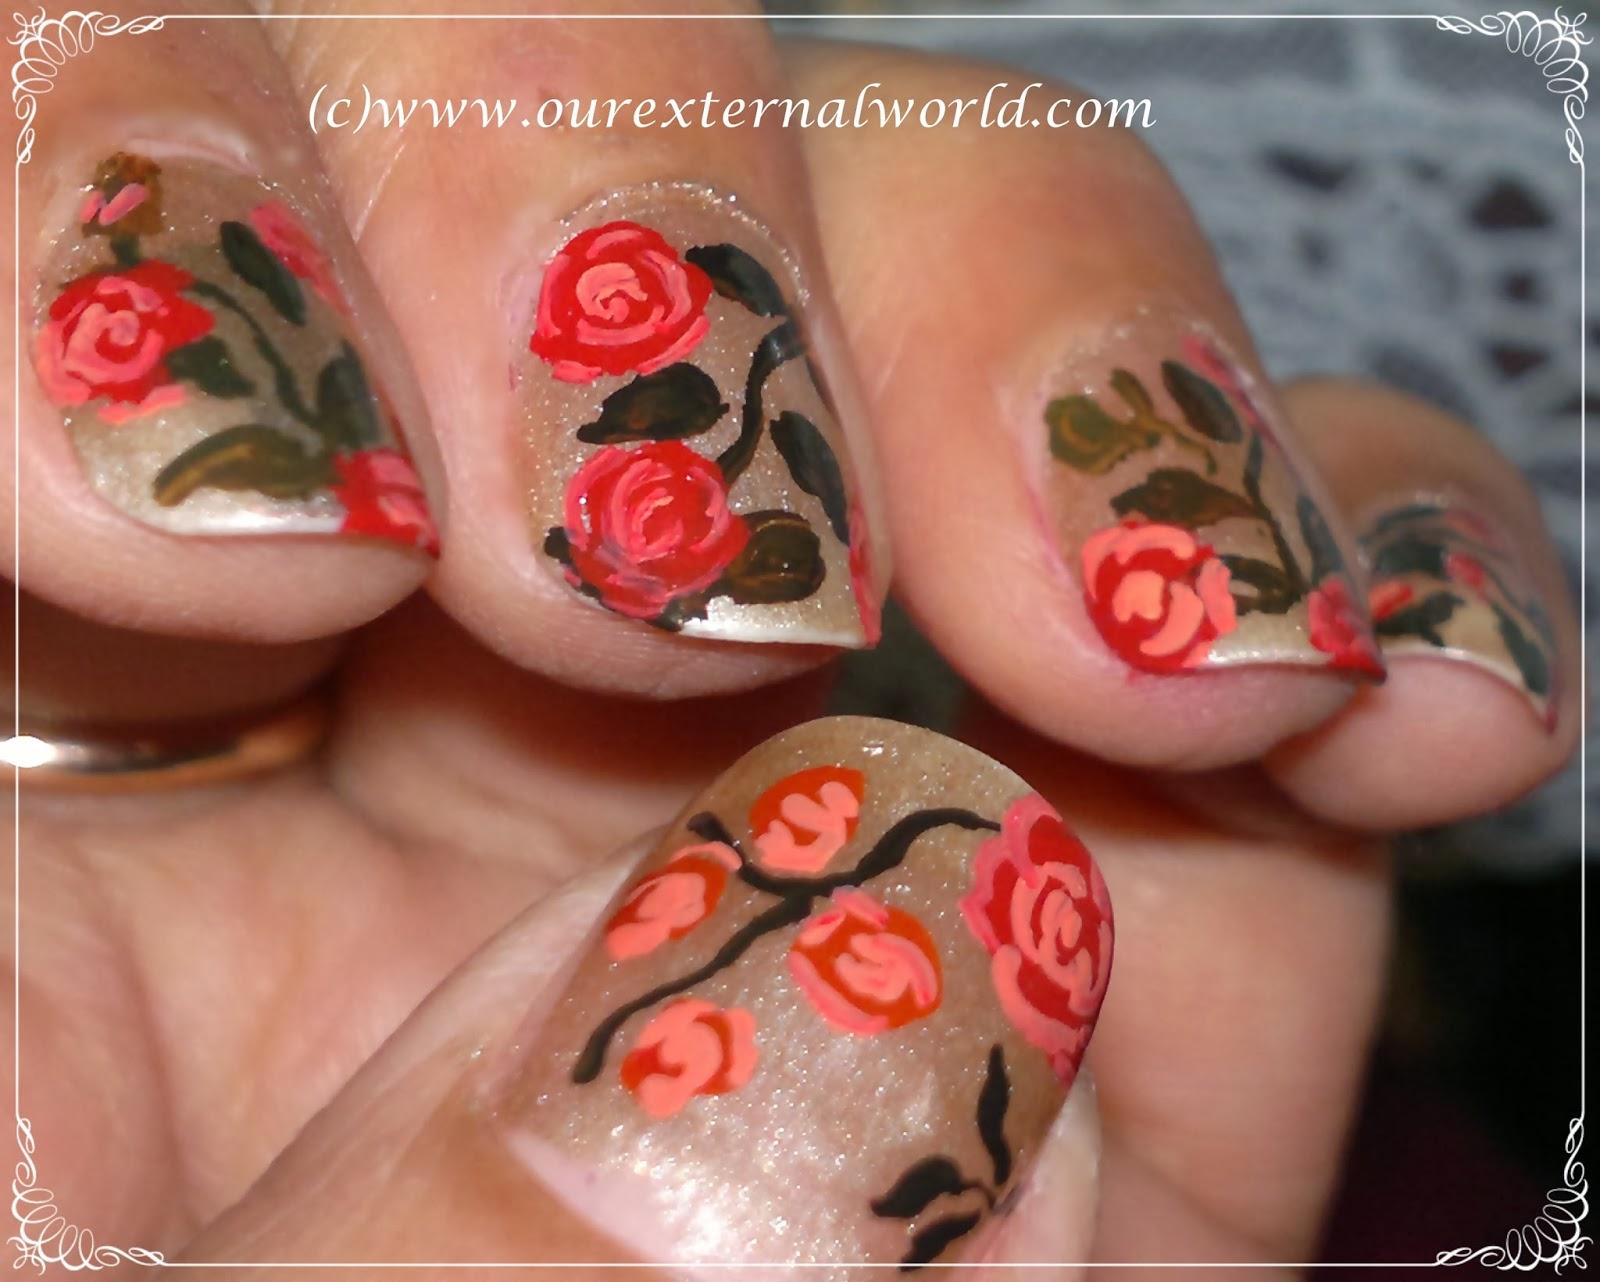 Vintage rose nail art tutorial vintage rose nail art tutorial inspired by robin moses prinsesfo Choice Image